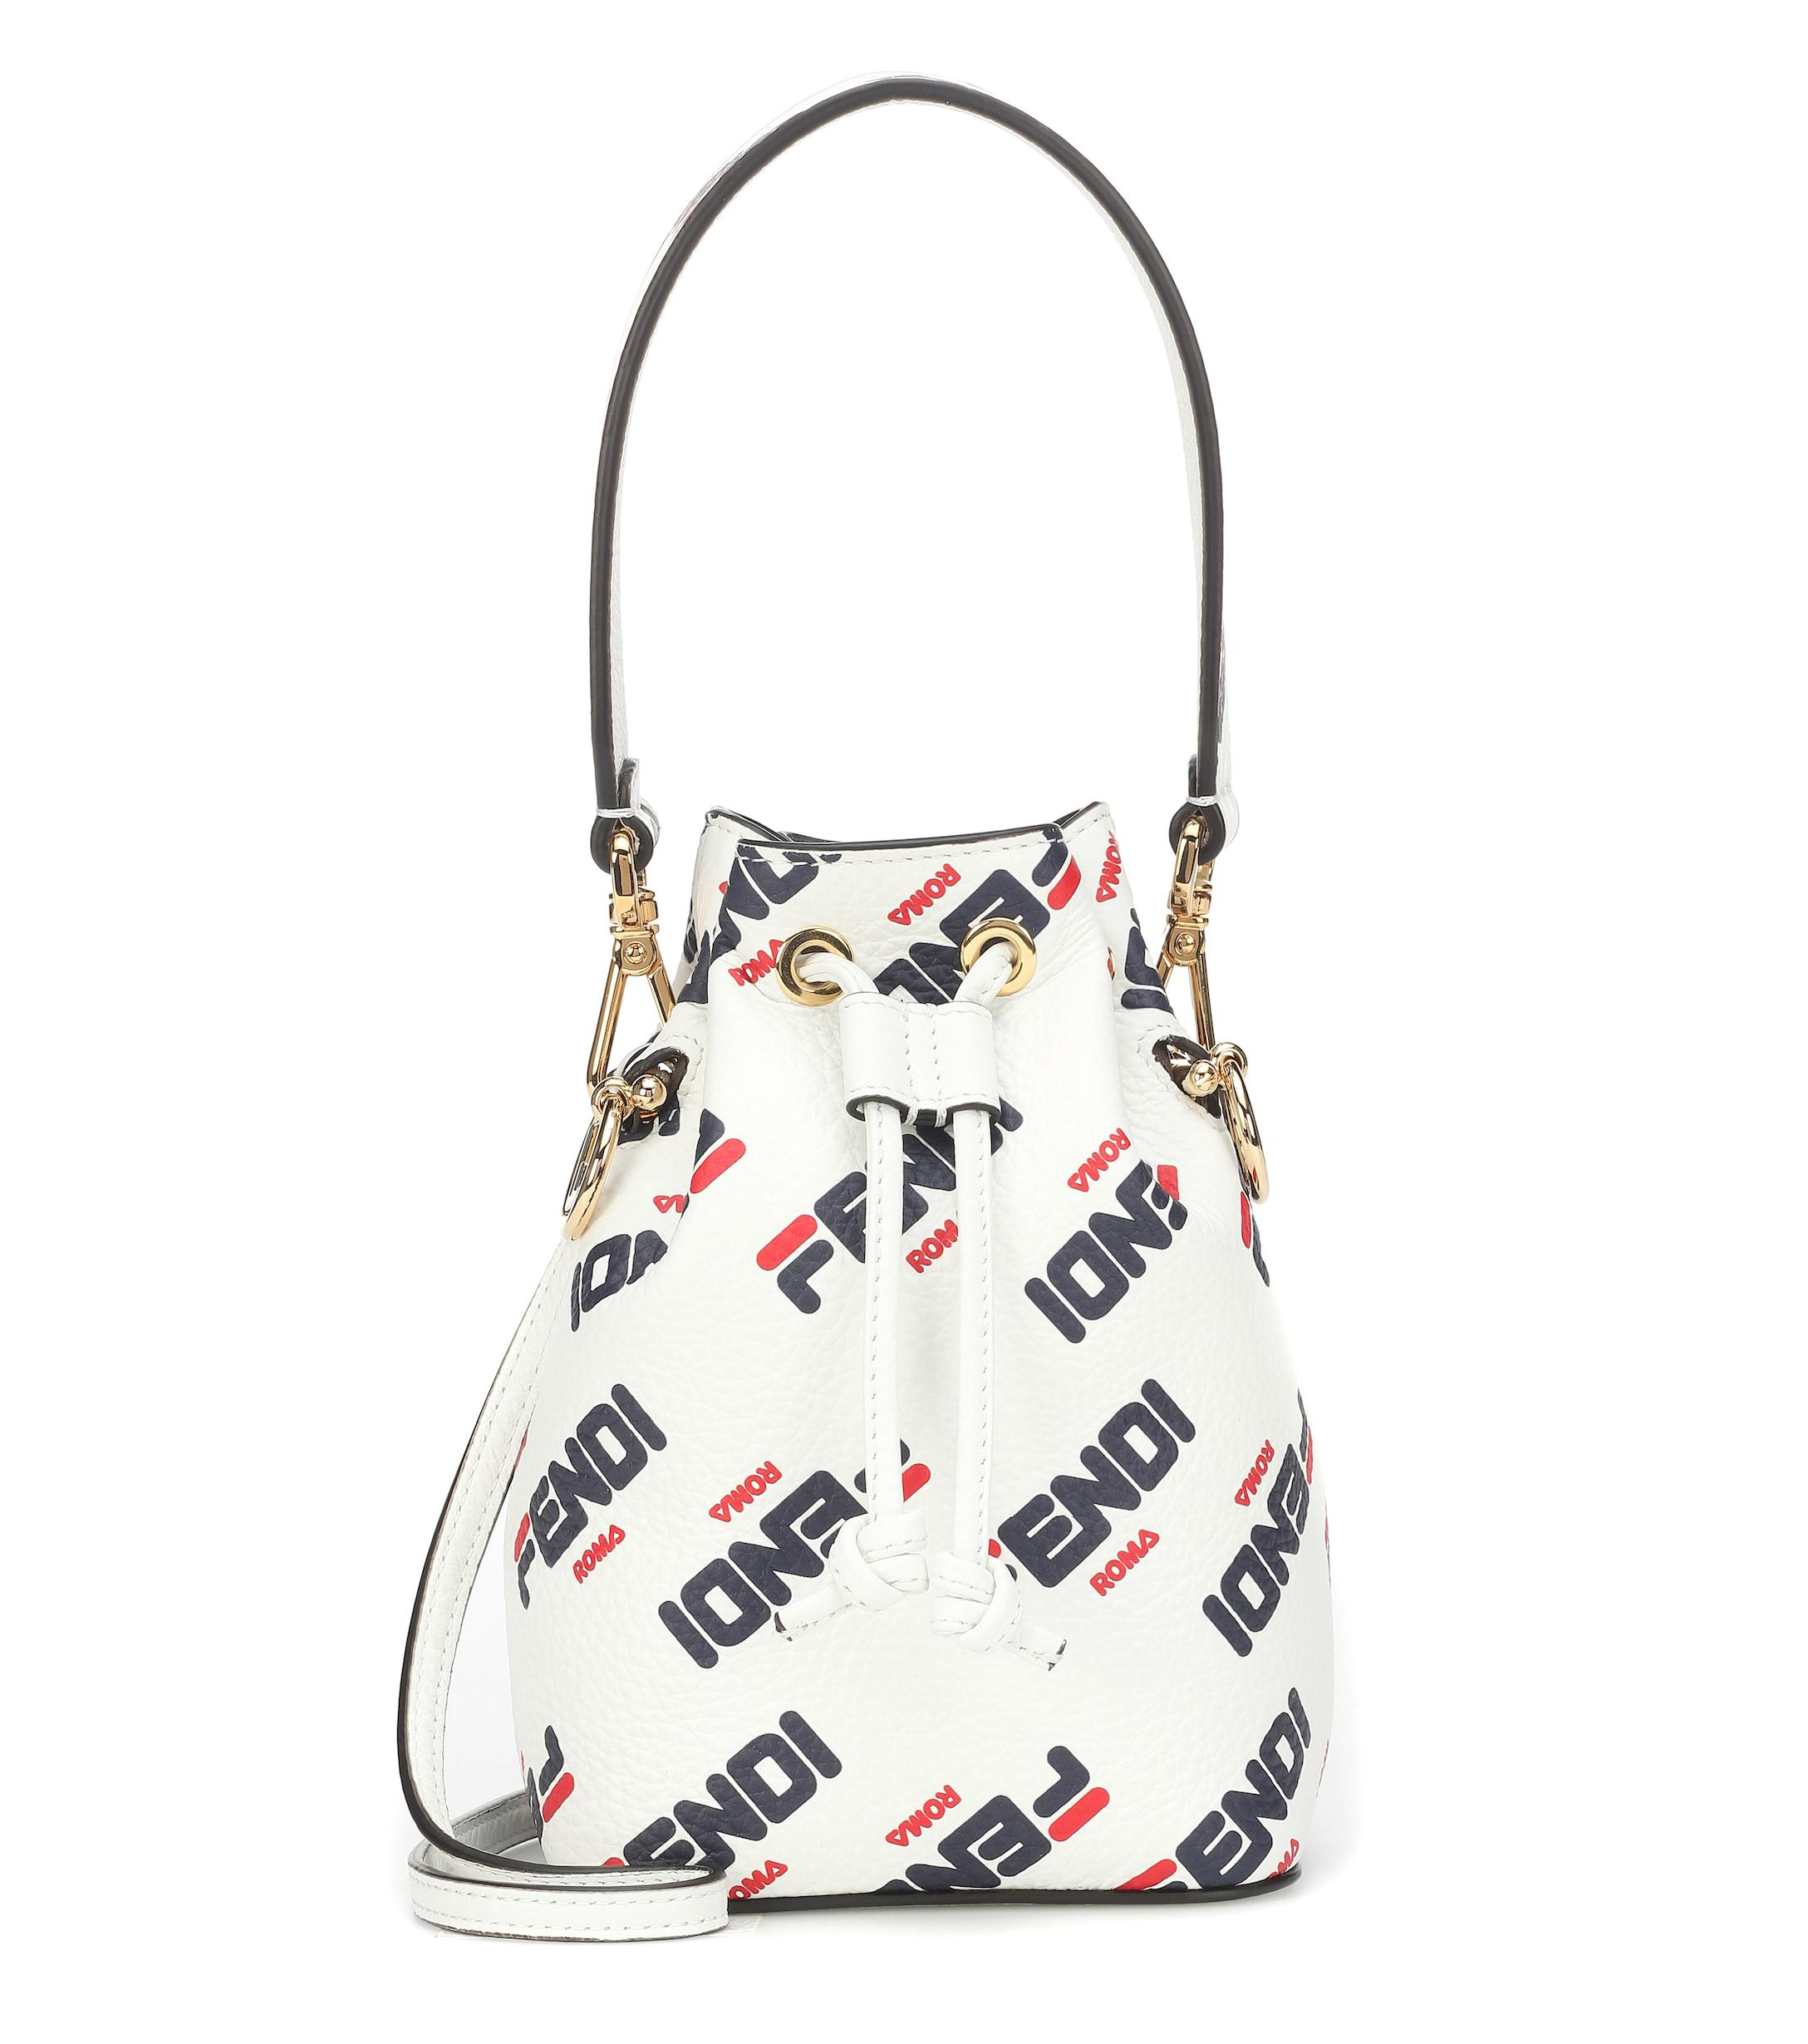 b0a325c8d40 Fendi. Women s Mania Mon Trésor Mini Bucket Bag